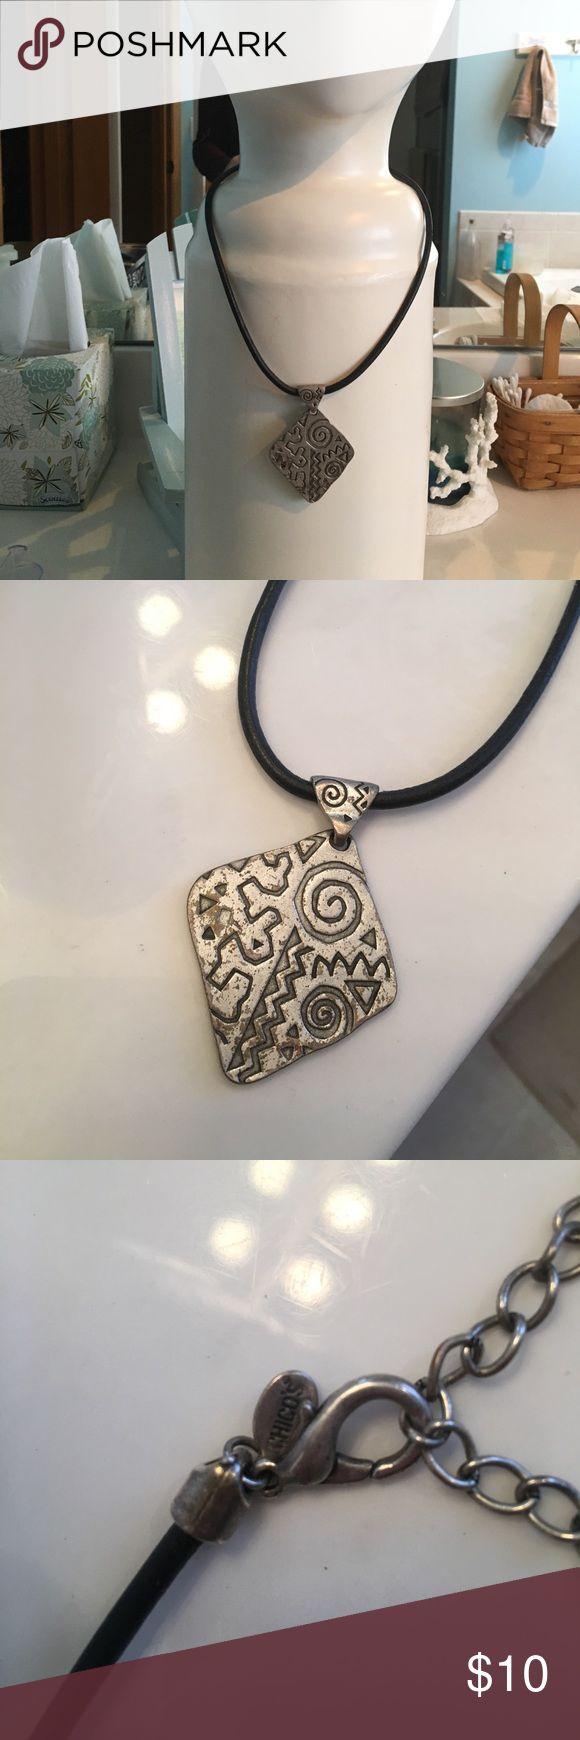 Chico's Black Leather Aztec Necklace Chico's Black Leather Aztec Short Necklace Chico's Jewelry Necklaces